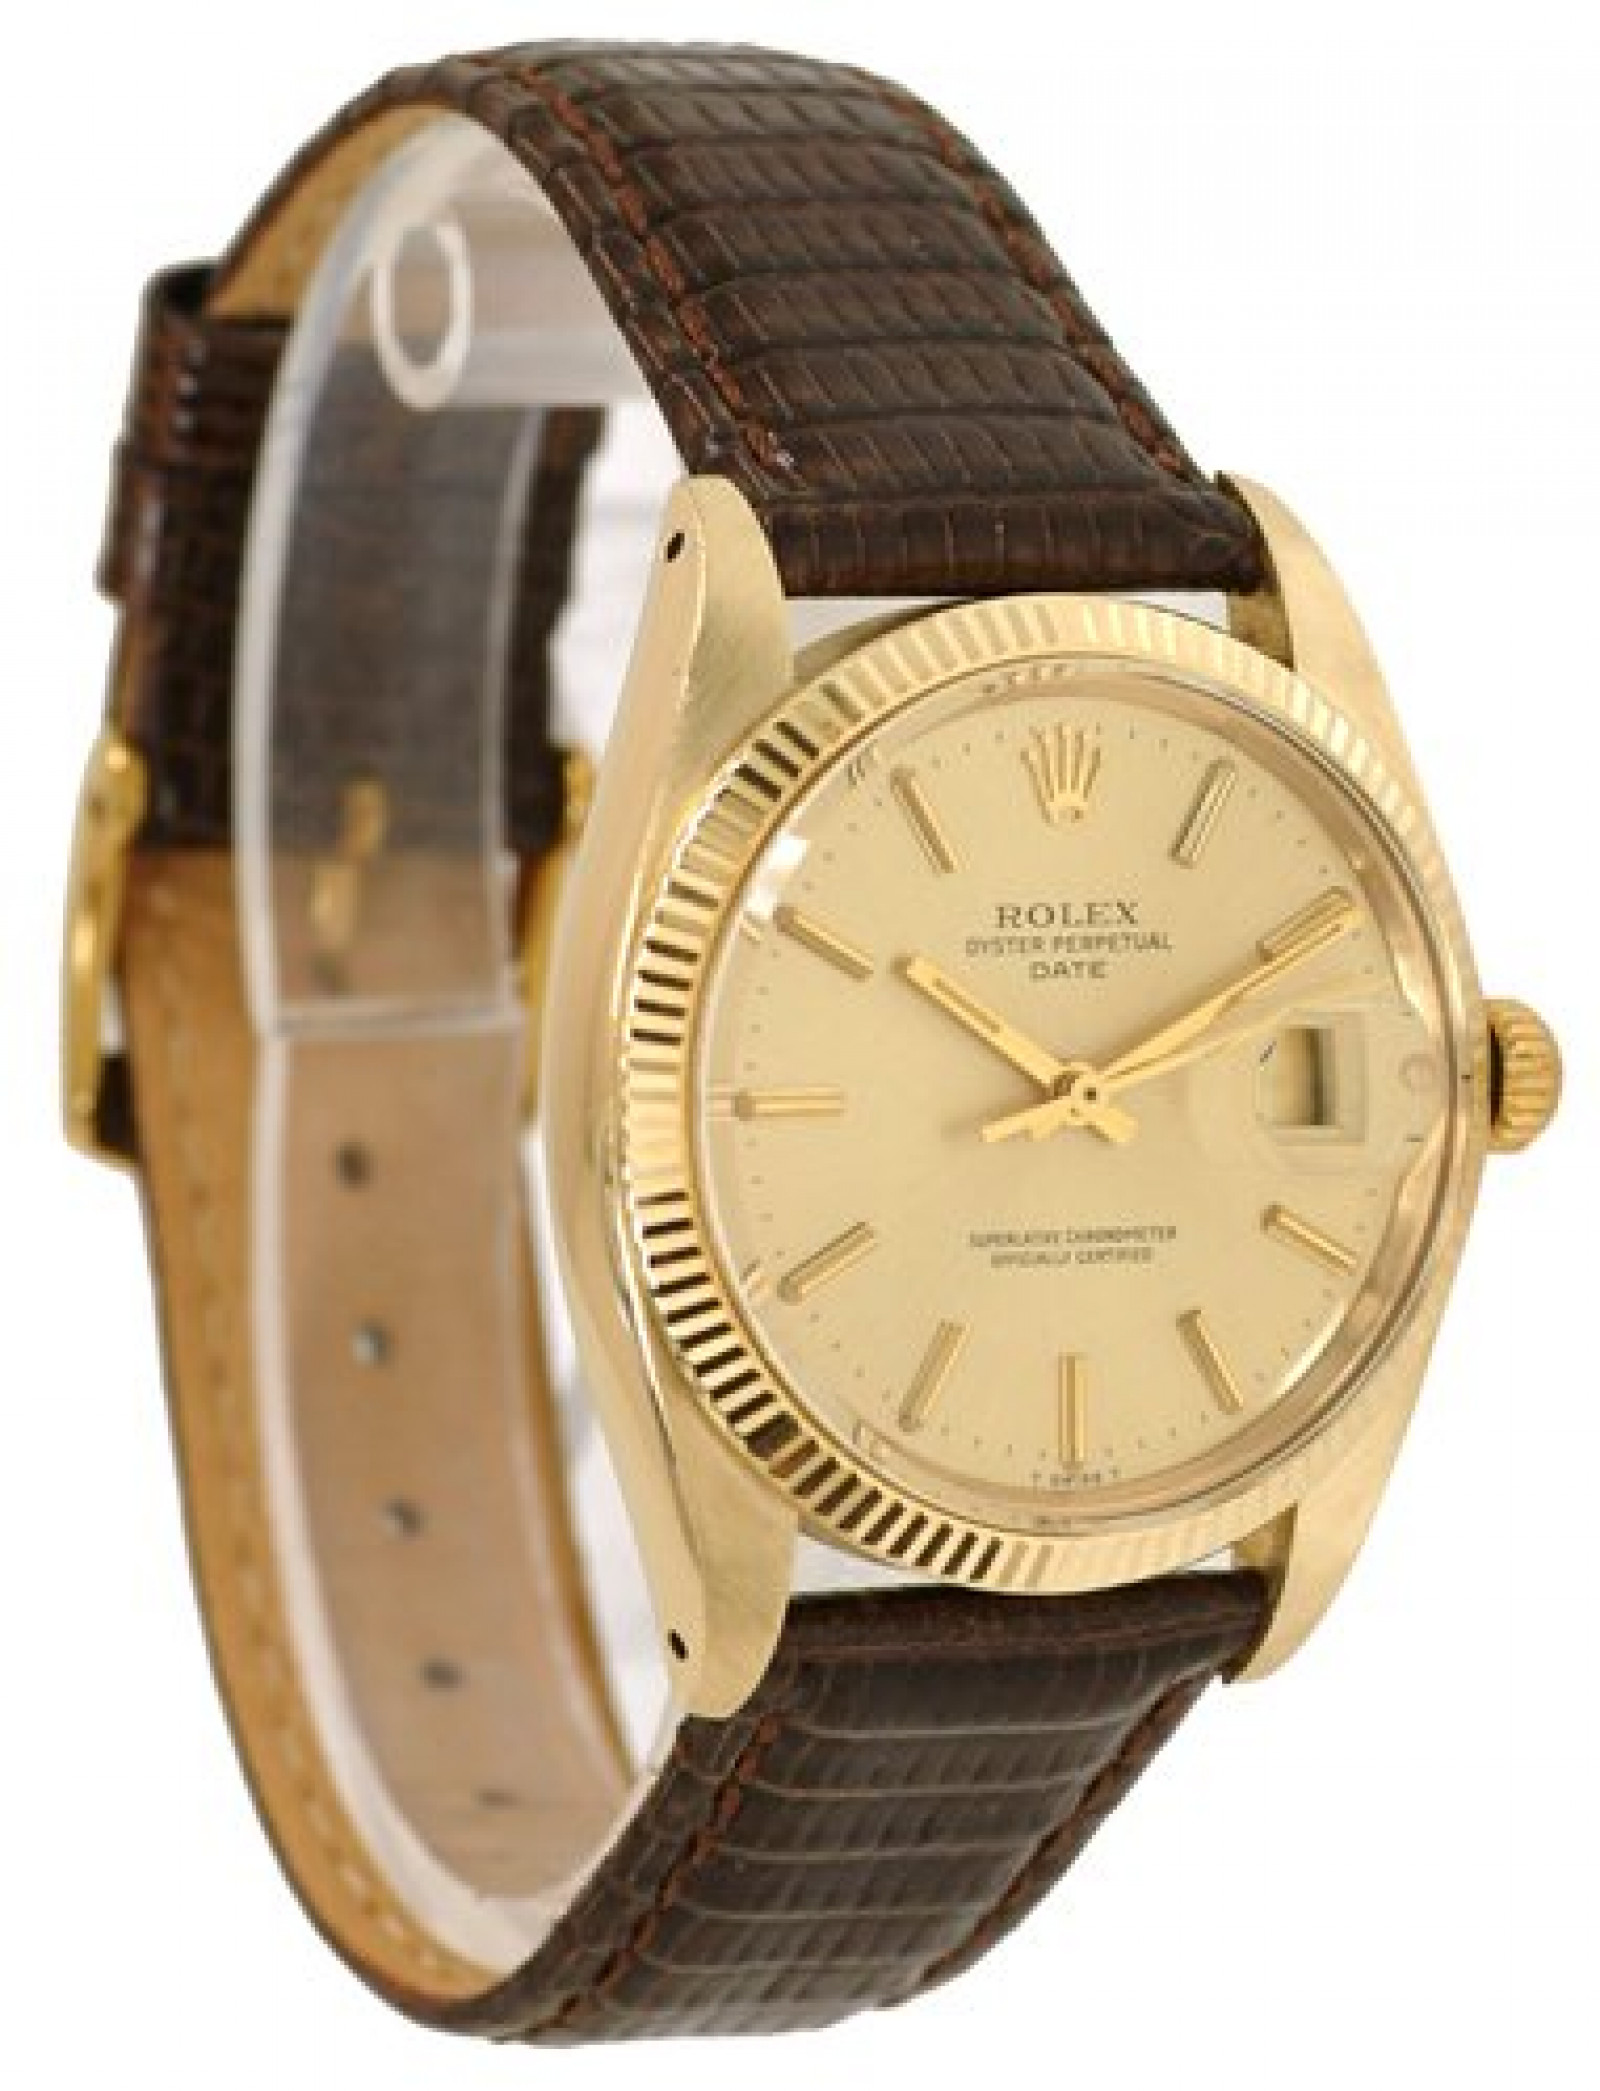 Vintage Rare Rolex Date 1503 Gold Year 1979